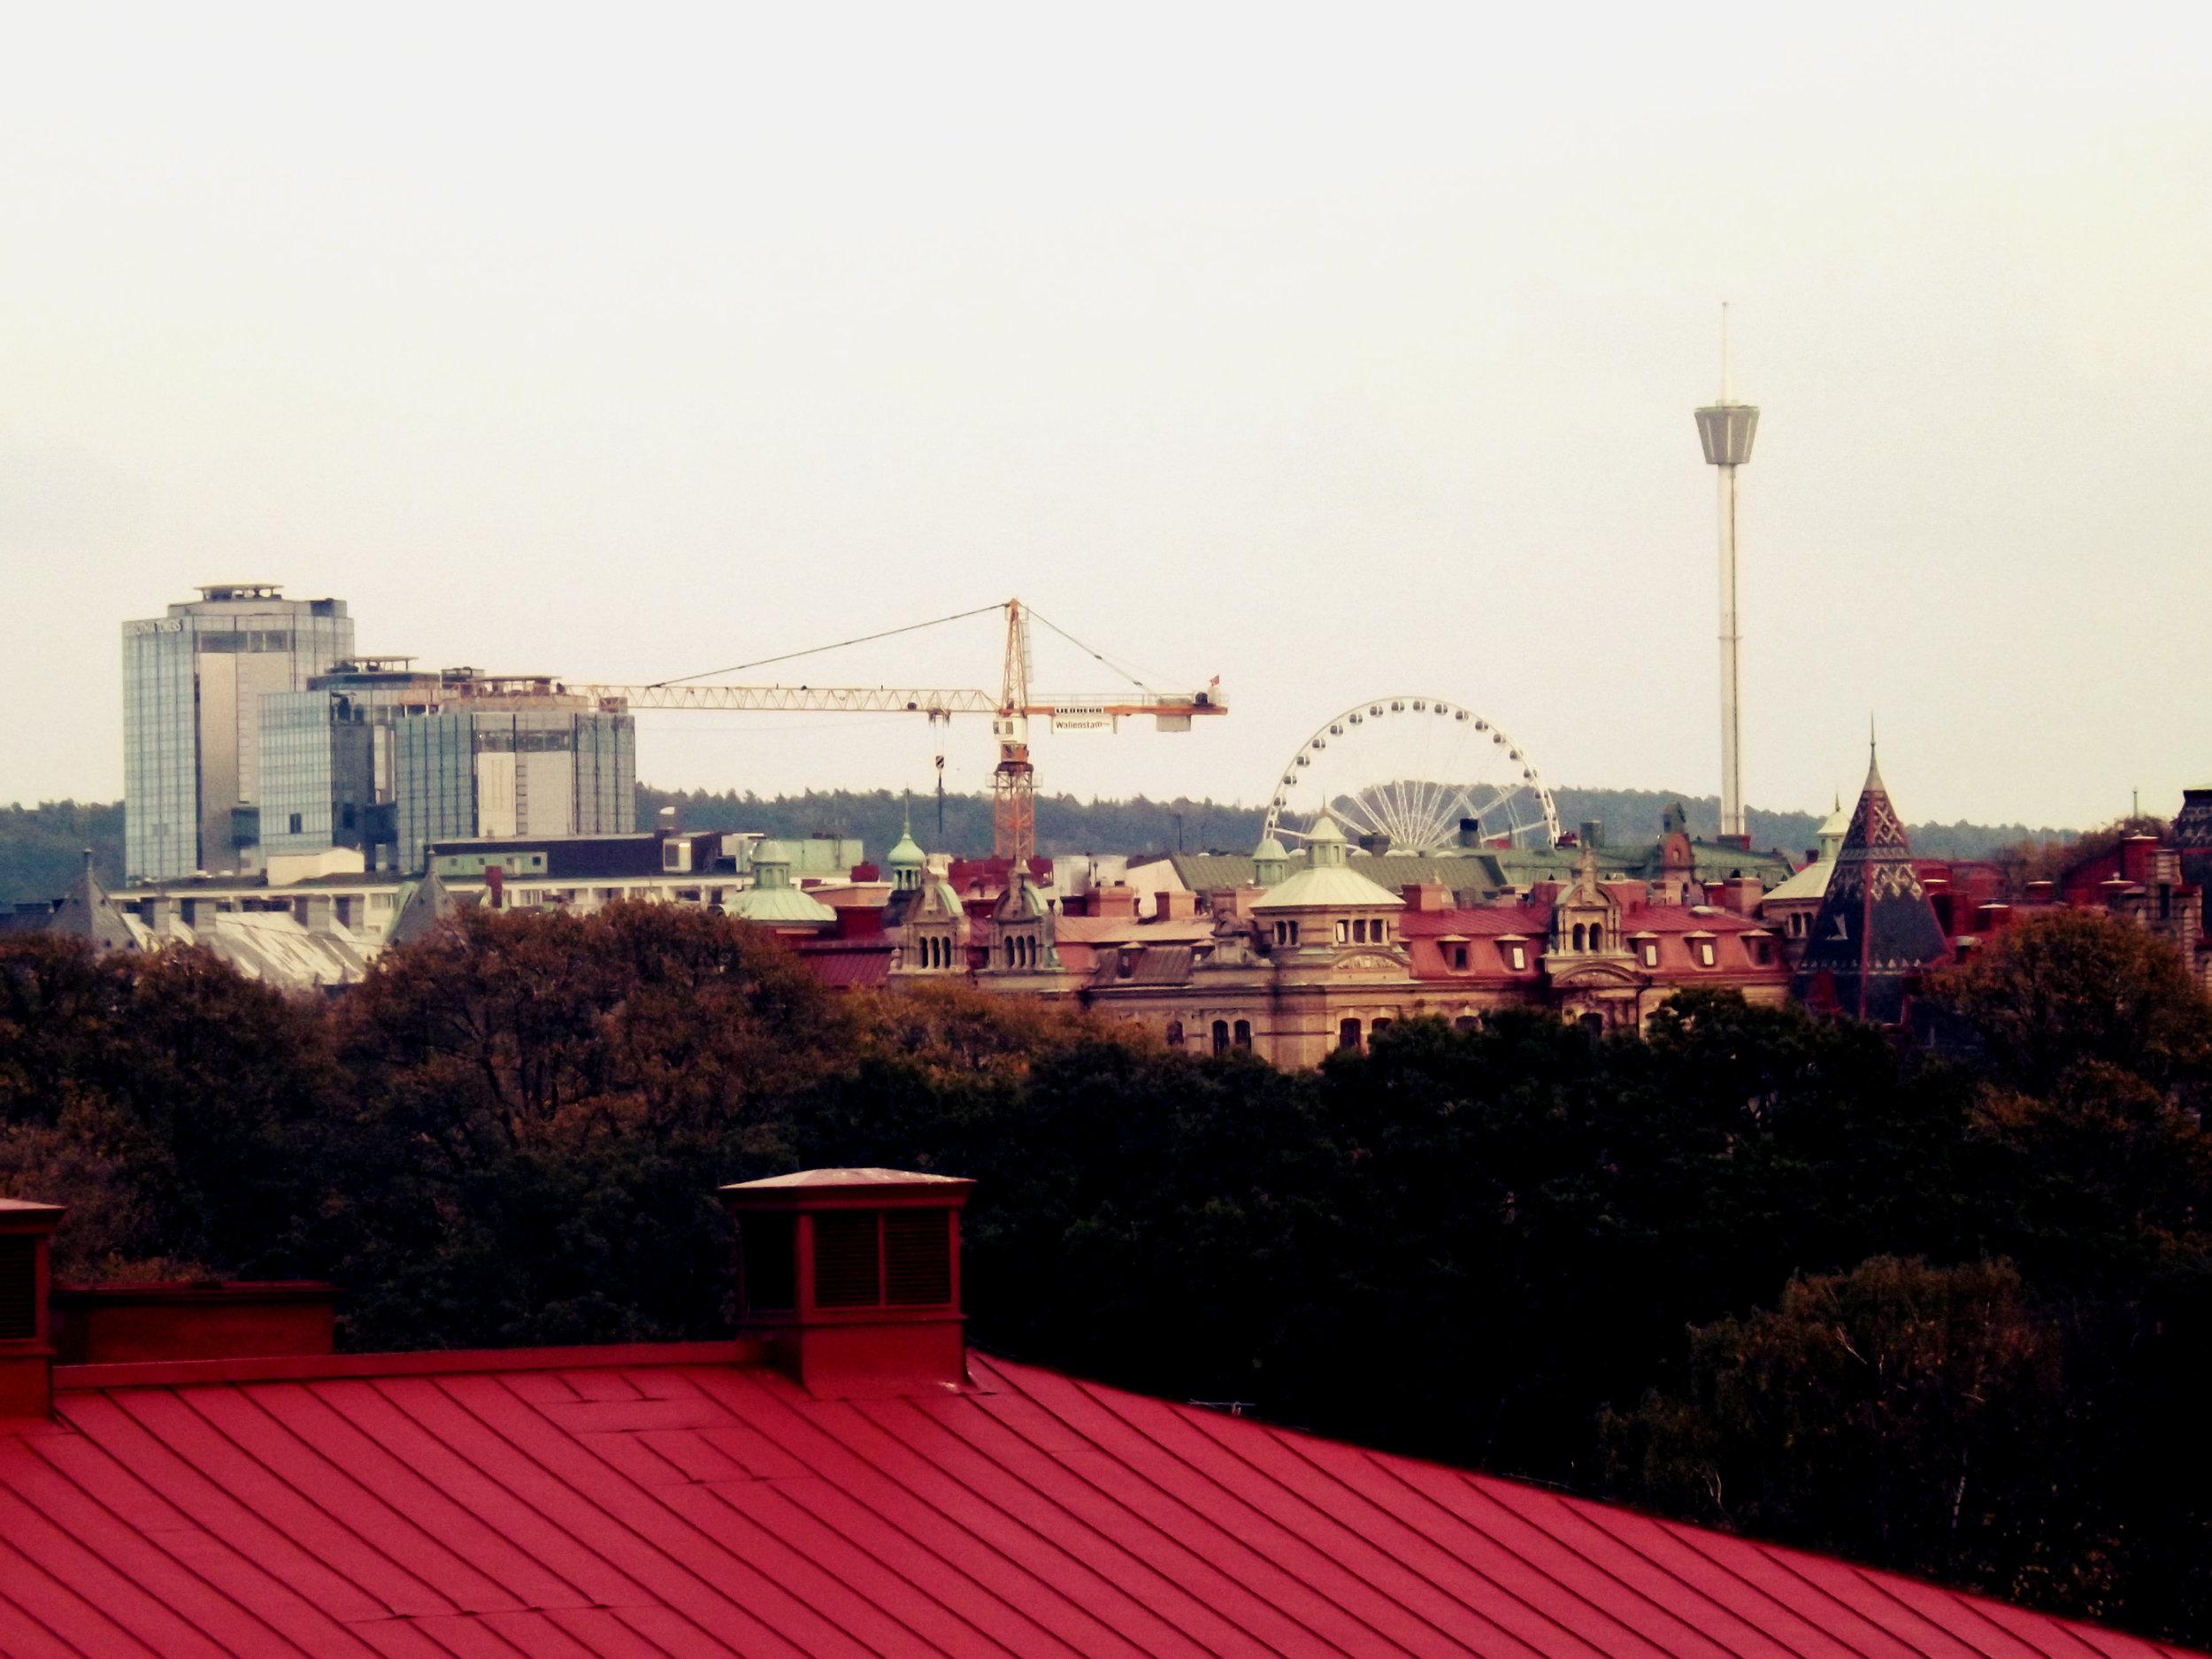 Gothenburg Ferris Wheel + Construction | Tall Girl Meets World